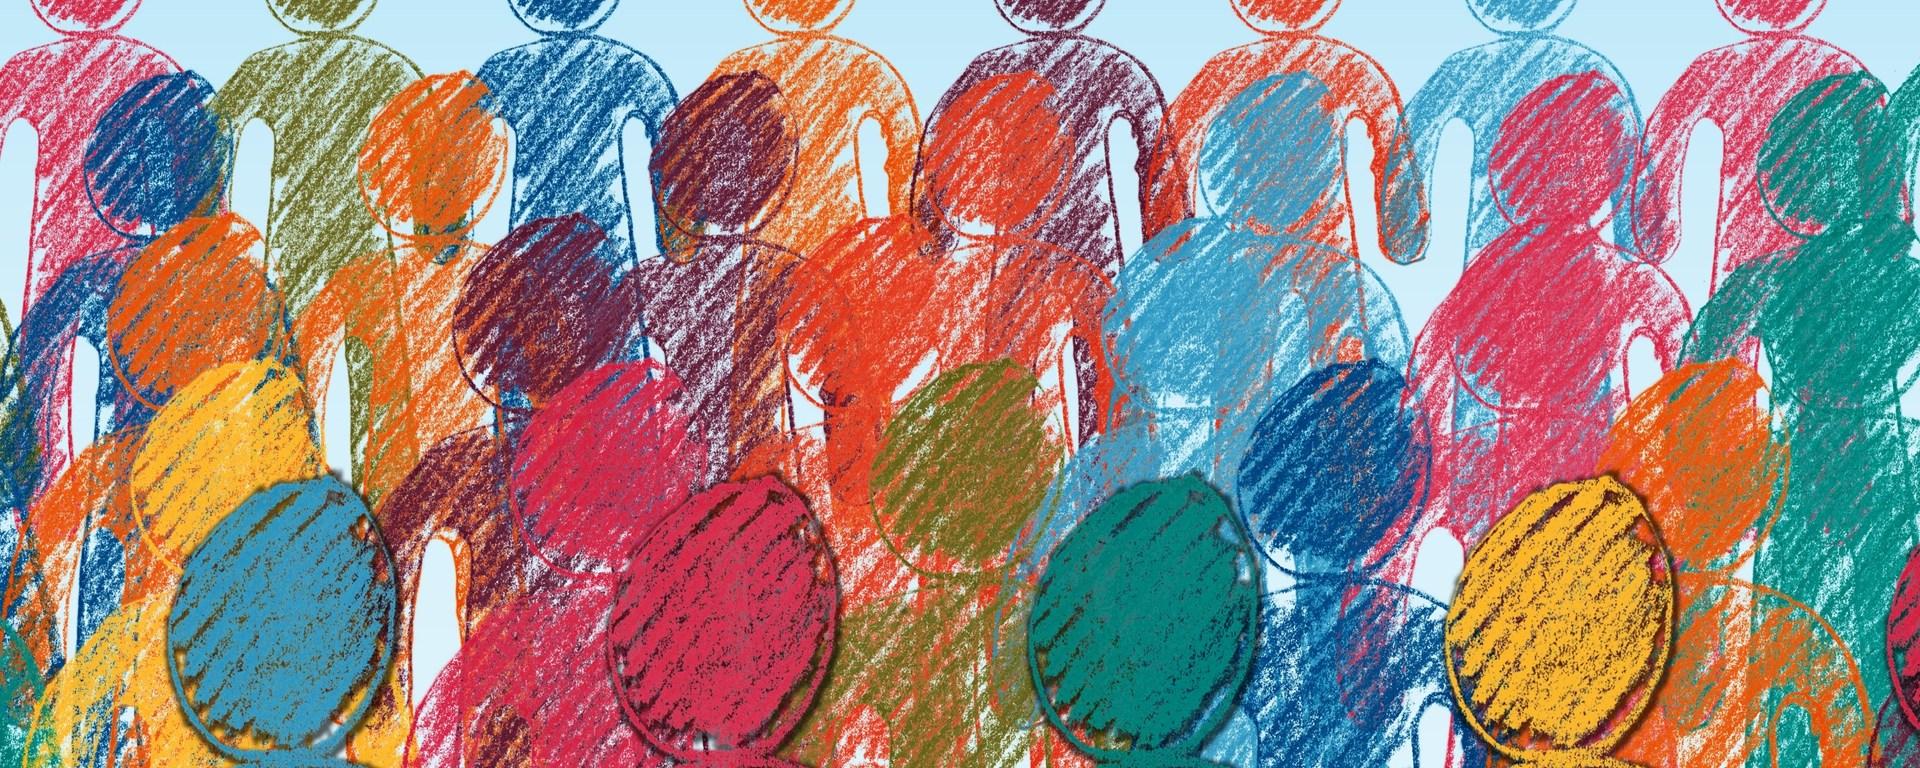 master's degree in community health online